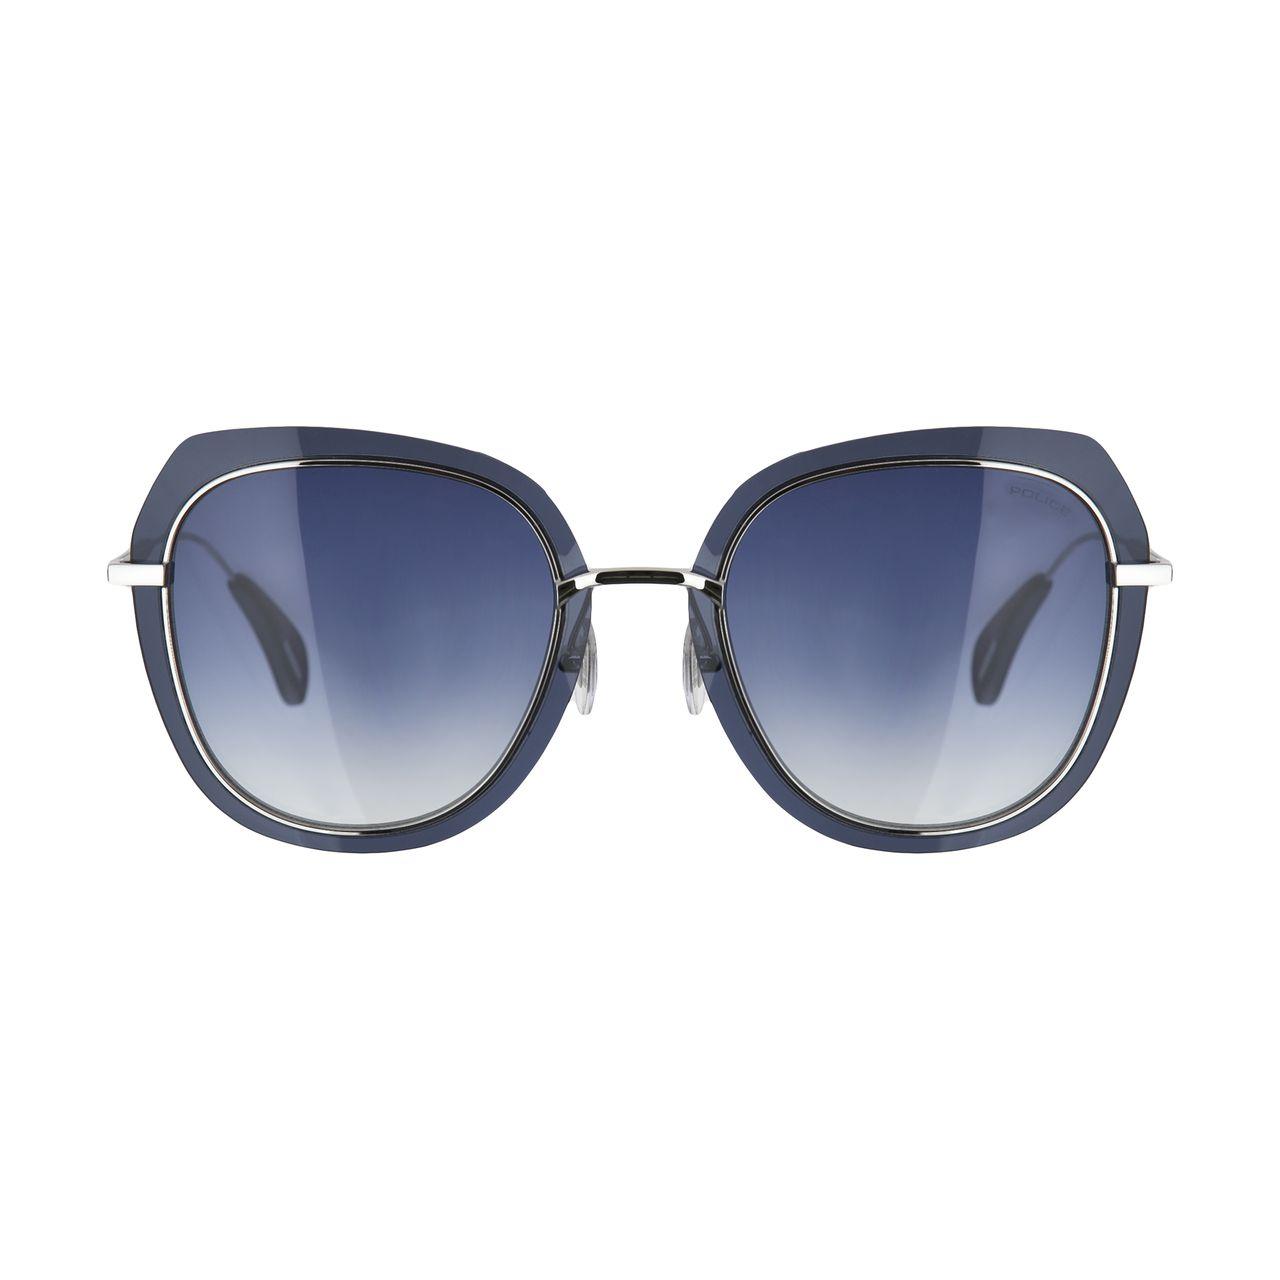 عینک آفتابی زنانه پلیس مدل SPL831M 579B